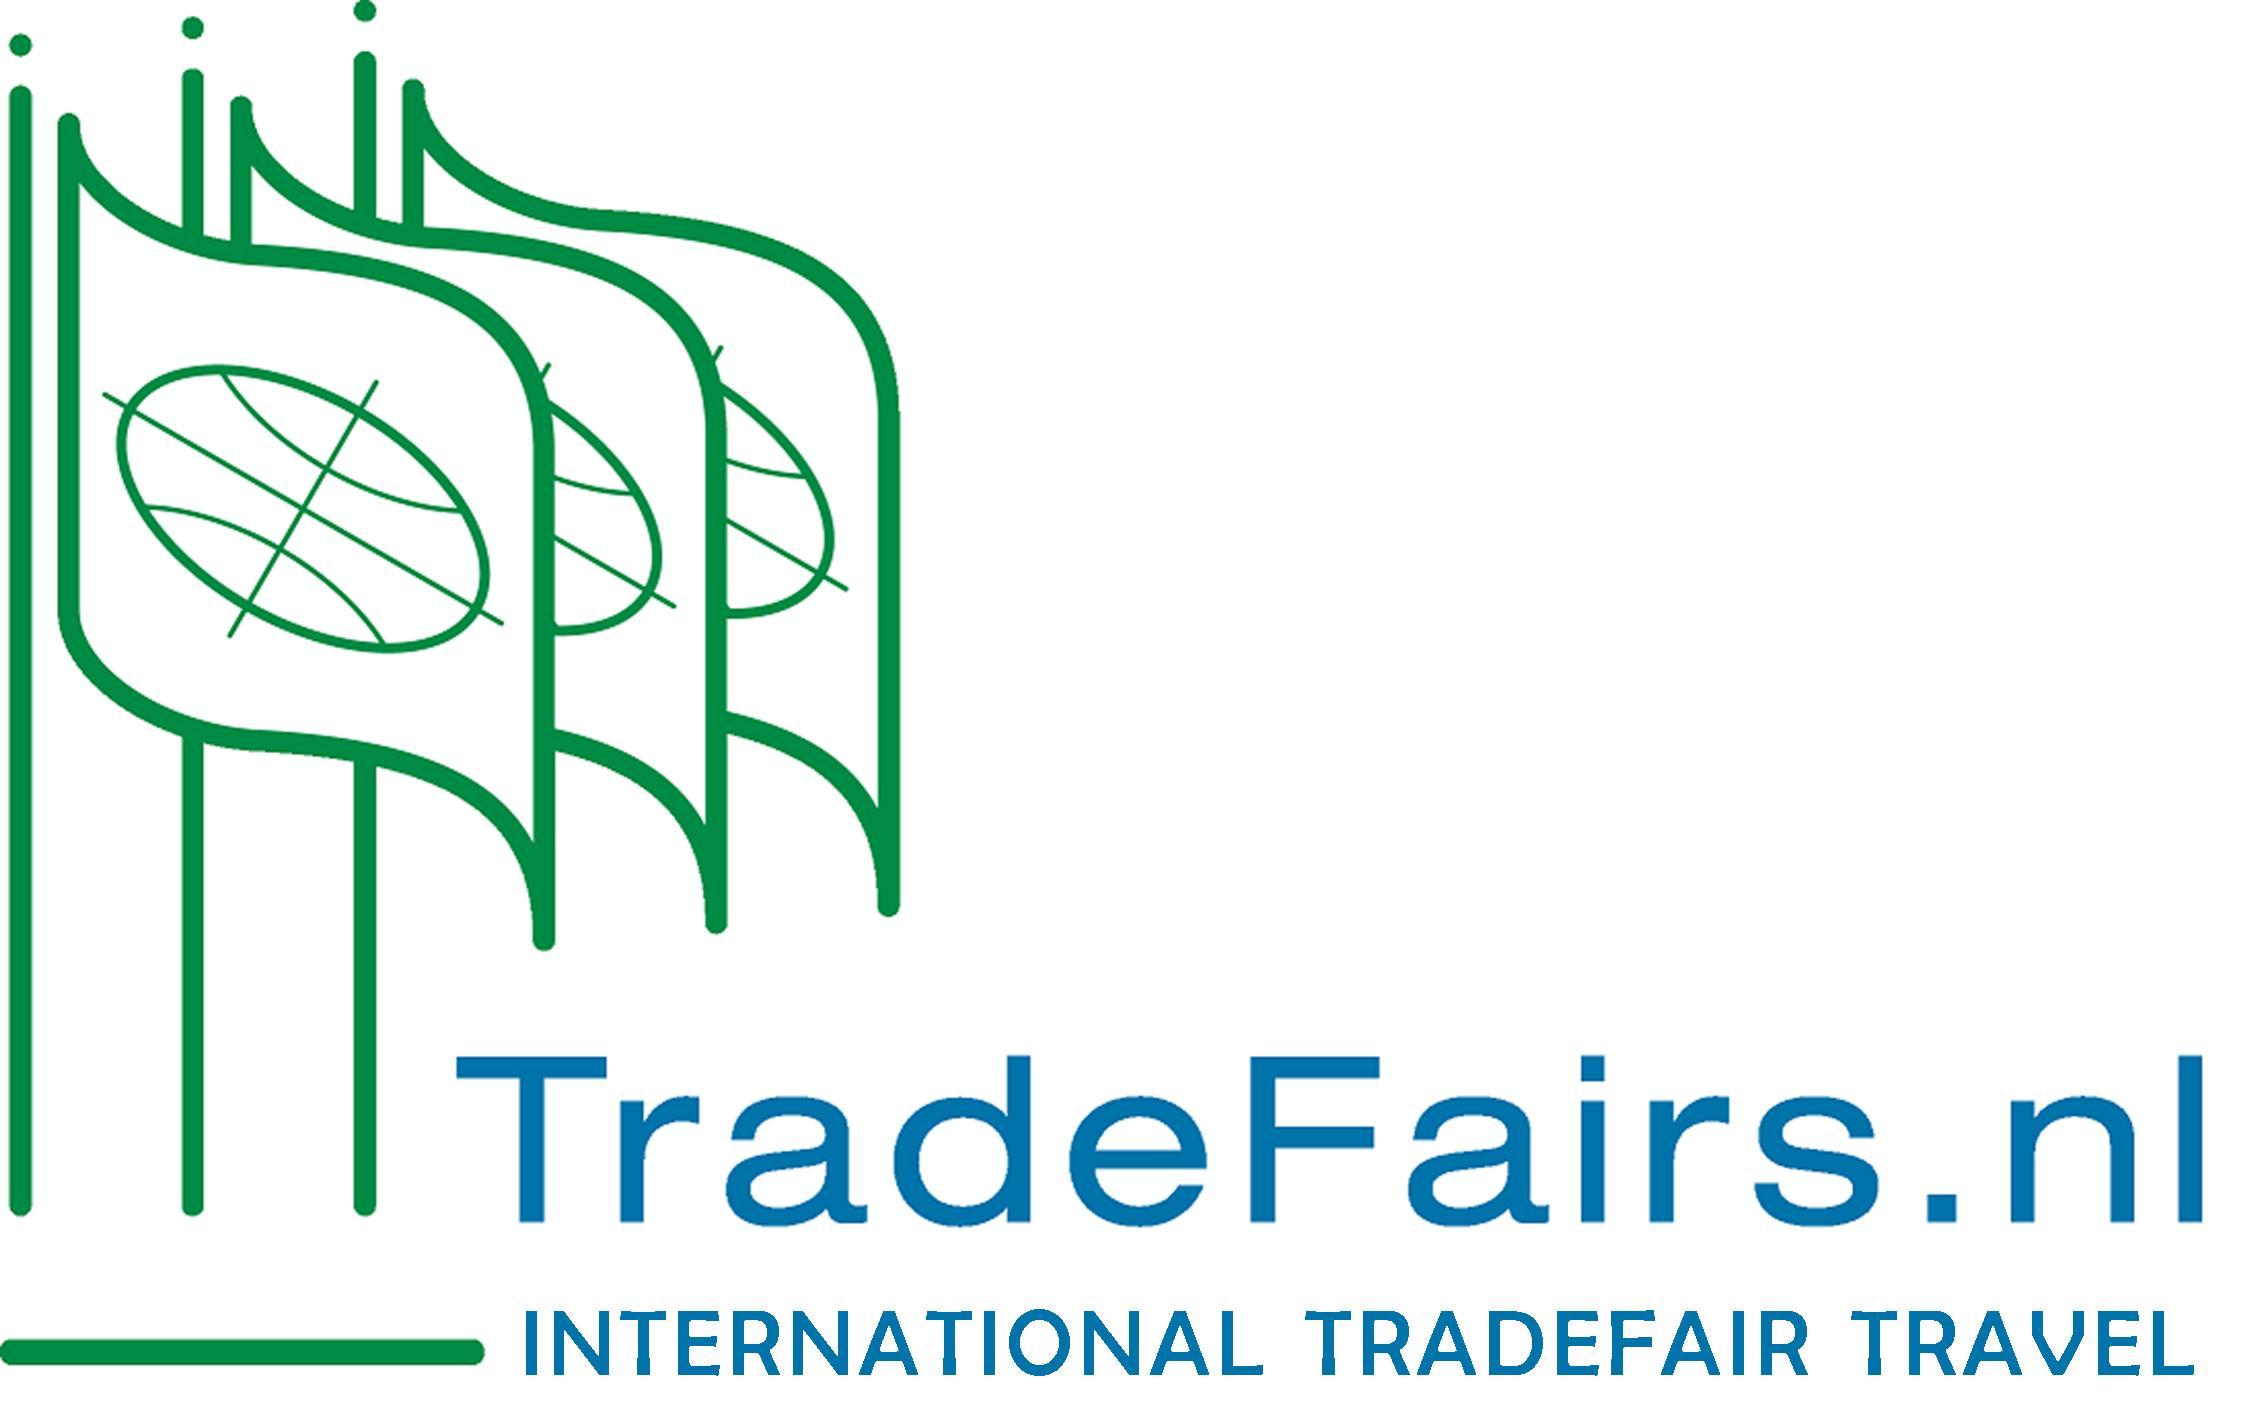 logo tradefairs.nl